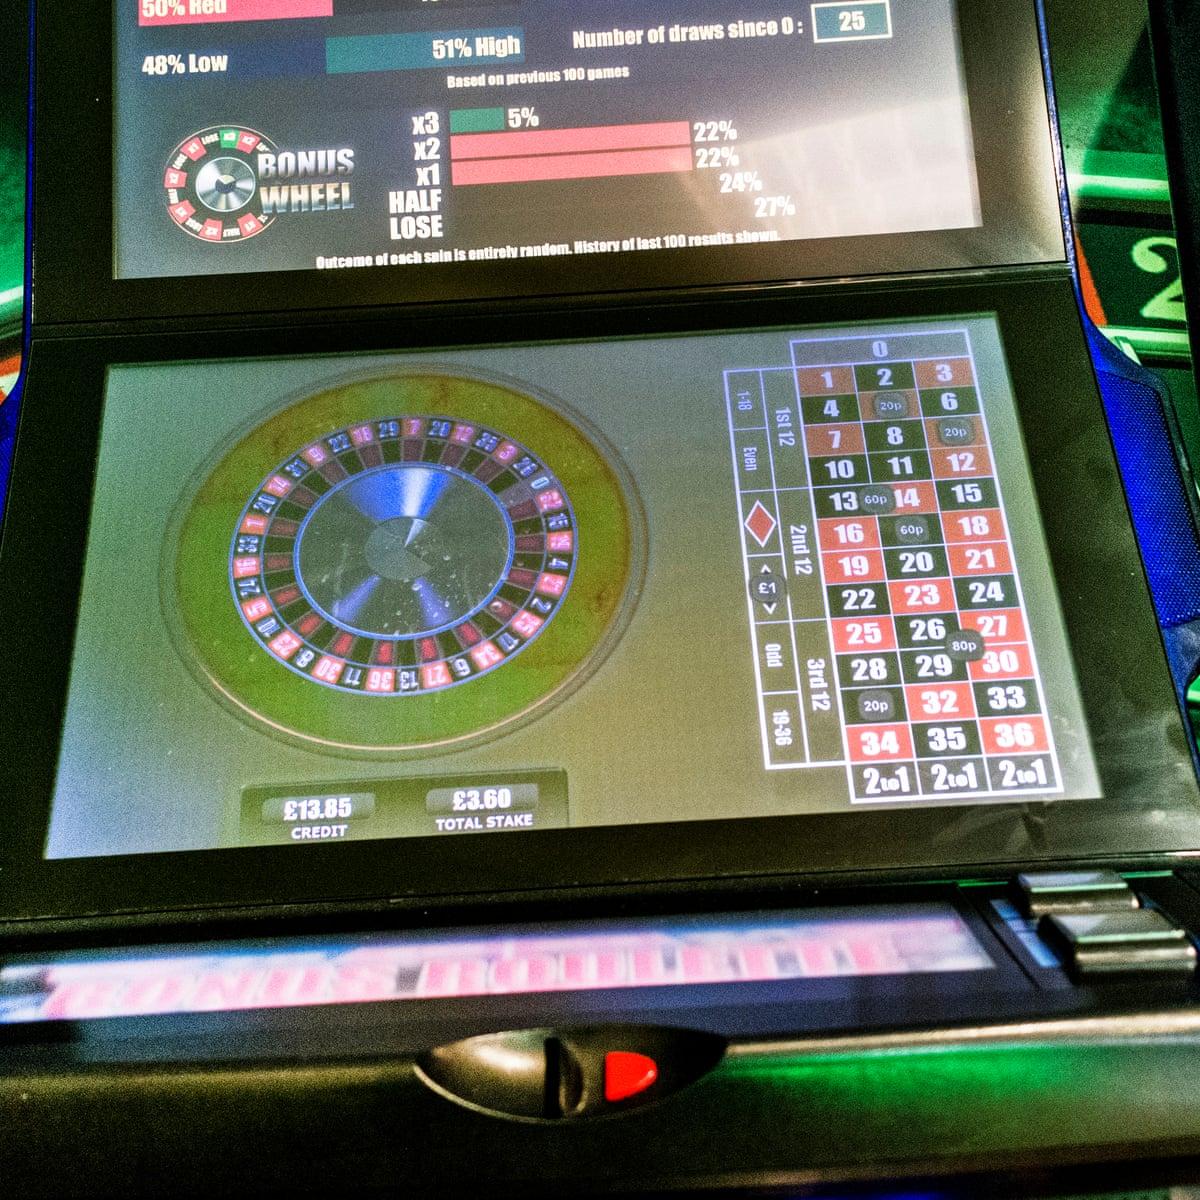 Fixed odds betting super score online soccer betting secrets capri